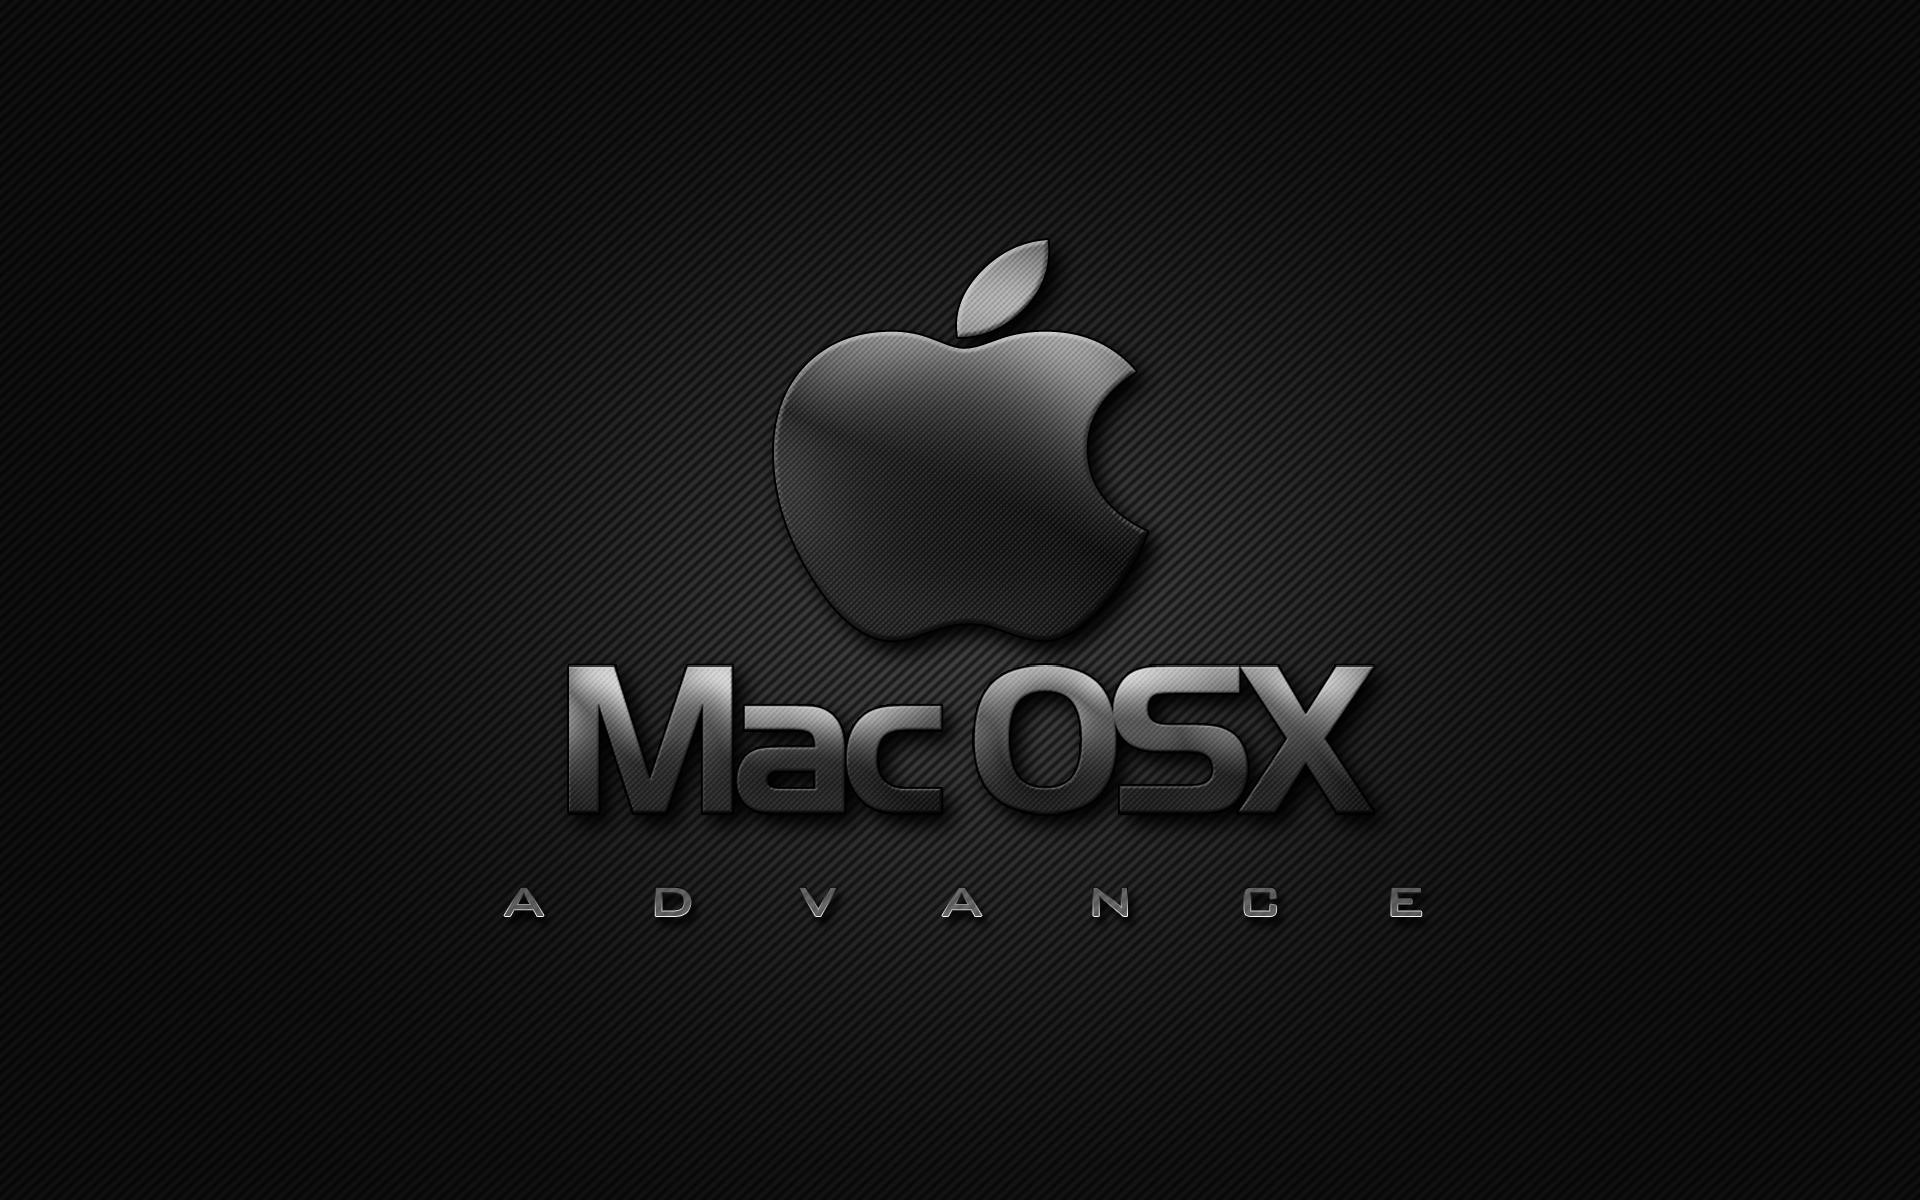 Apple Mac HD Wallpapers